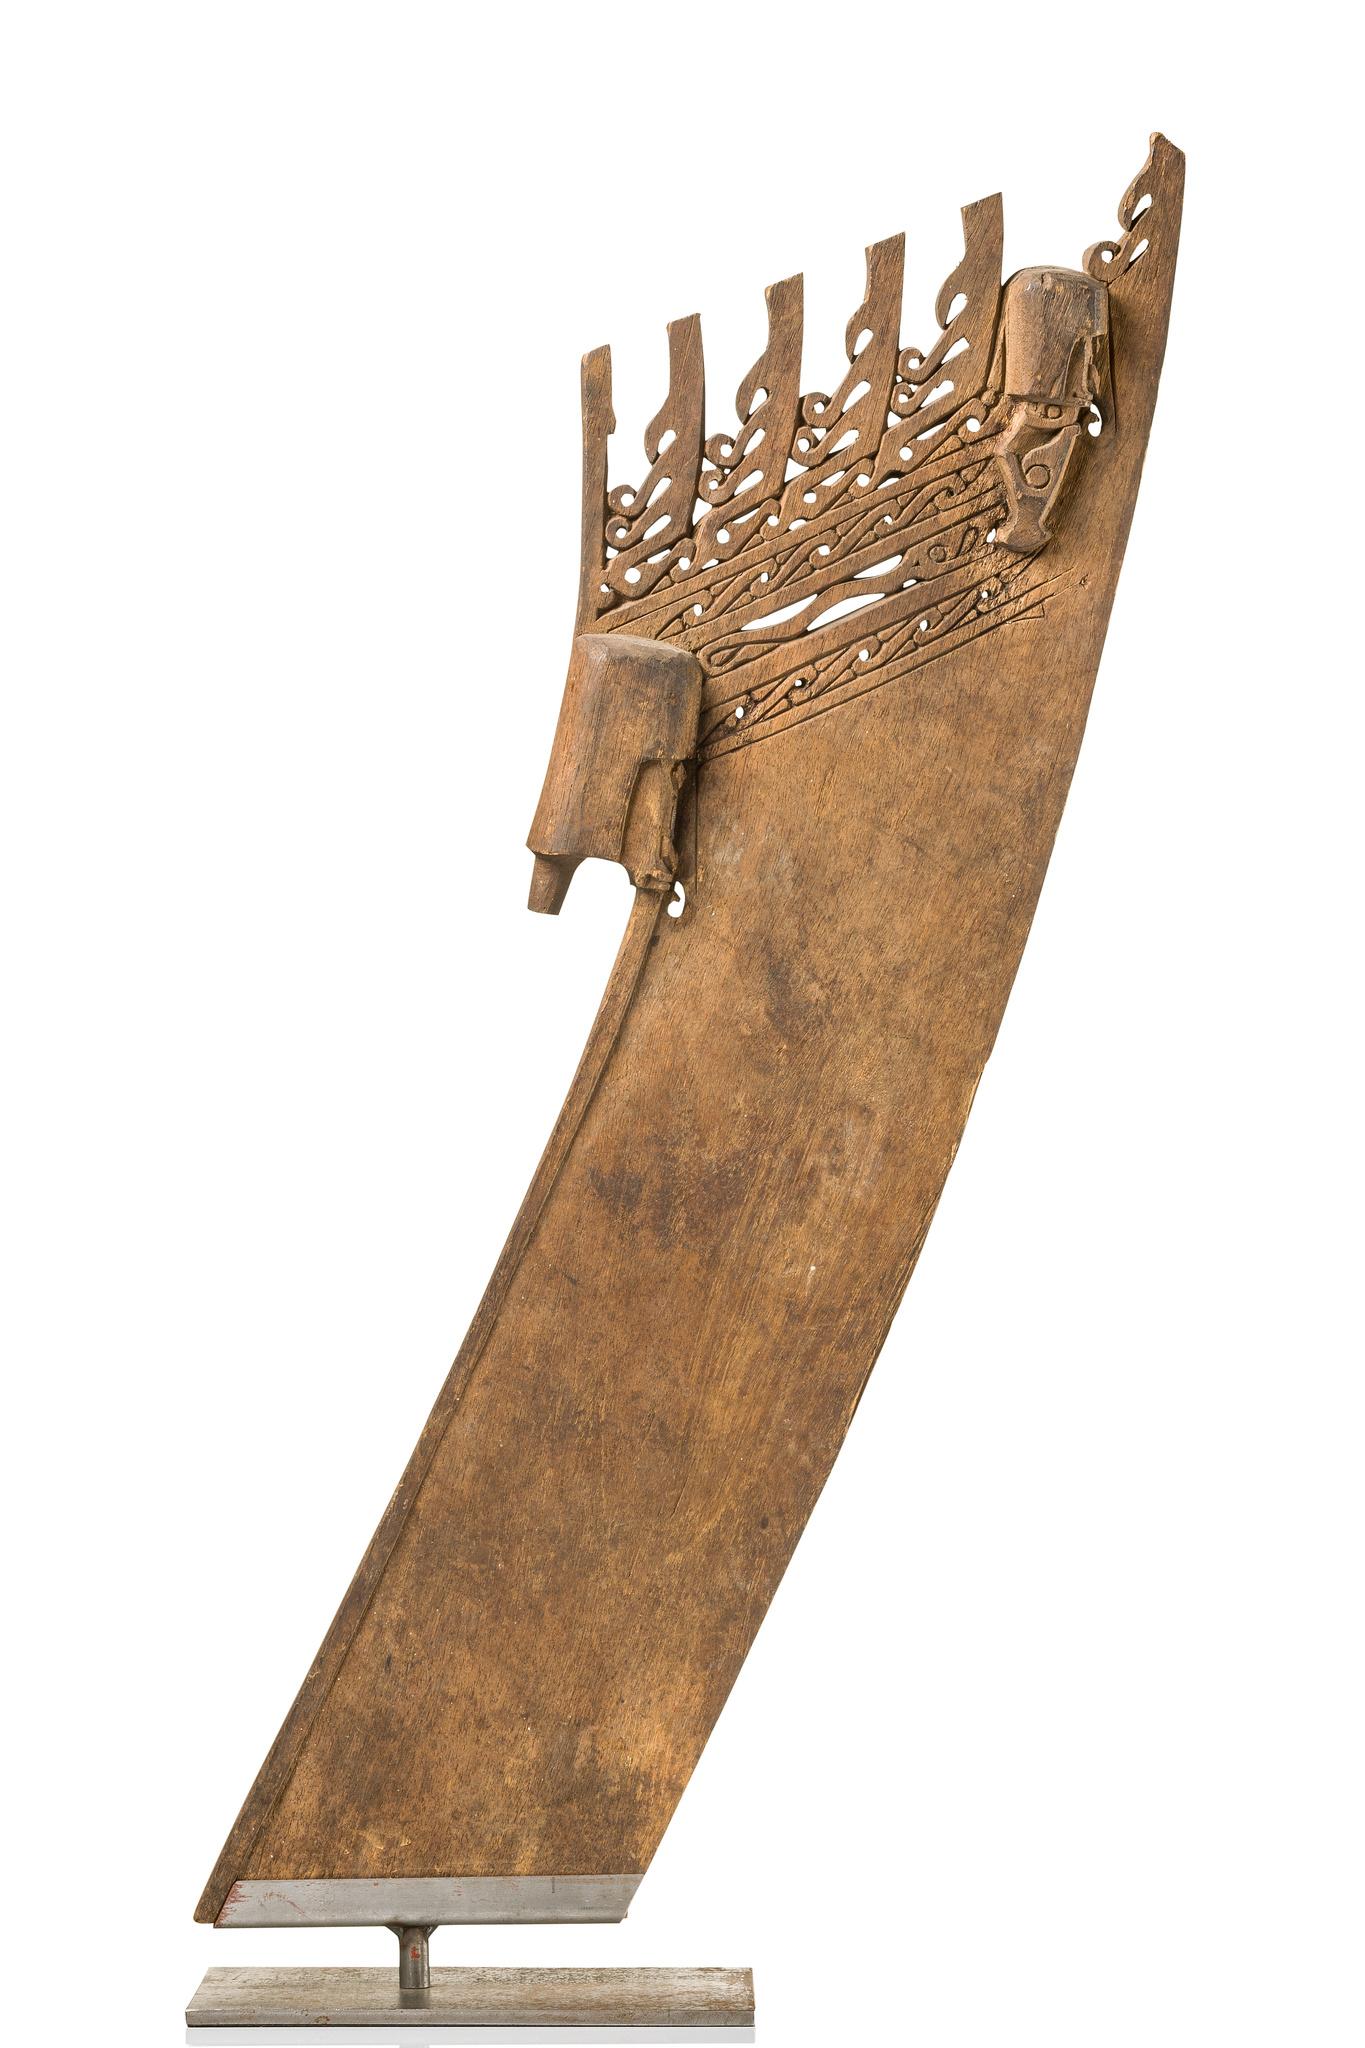 Prow ornament of a canoe